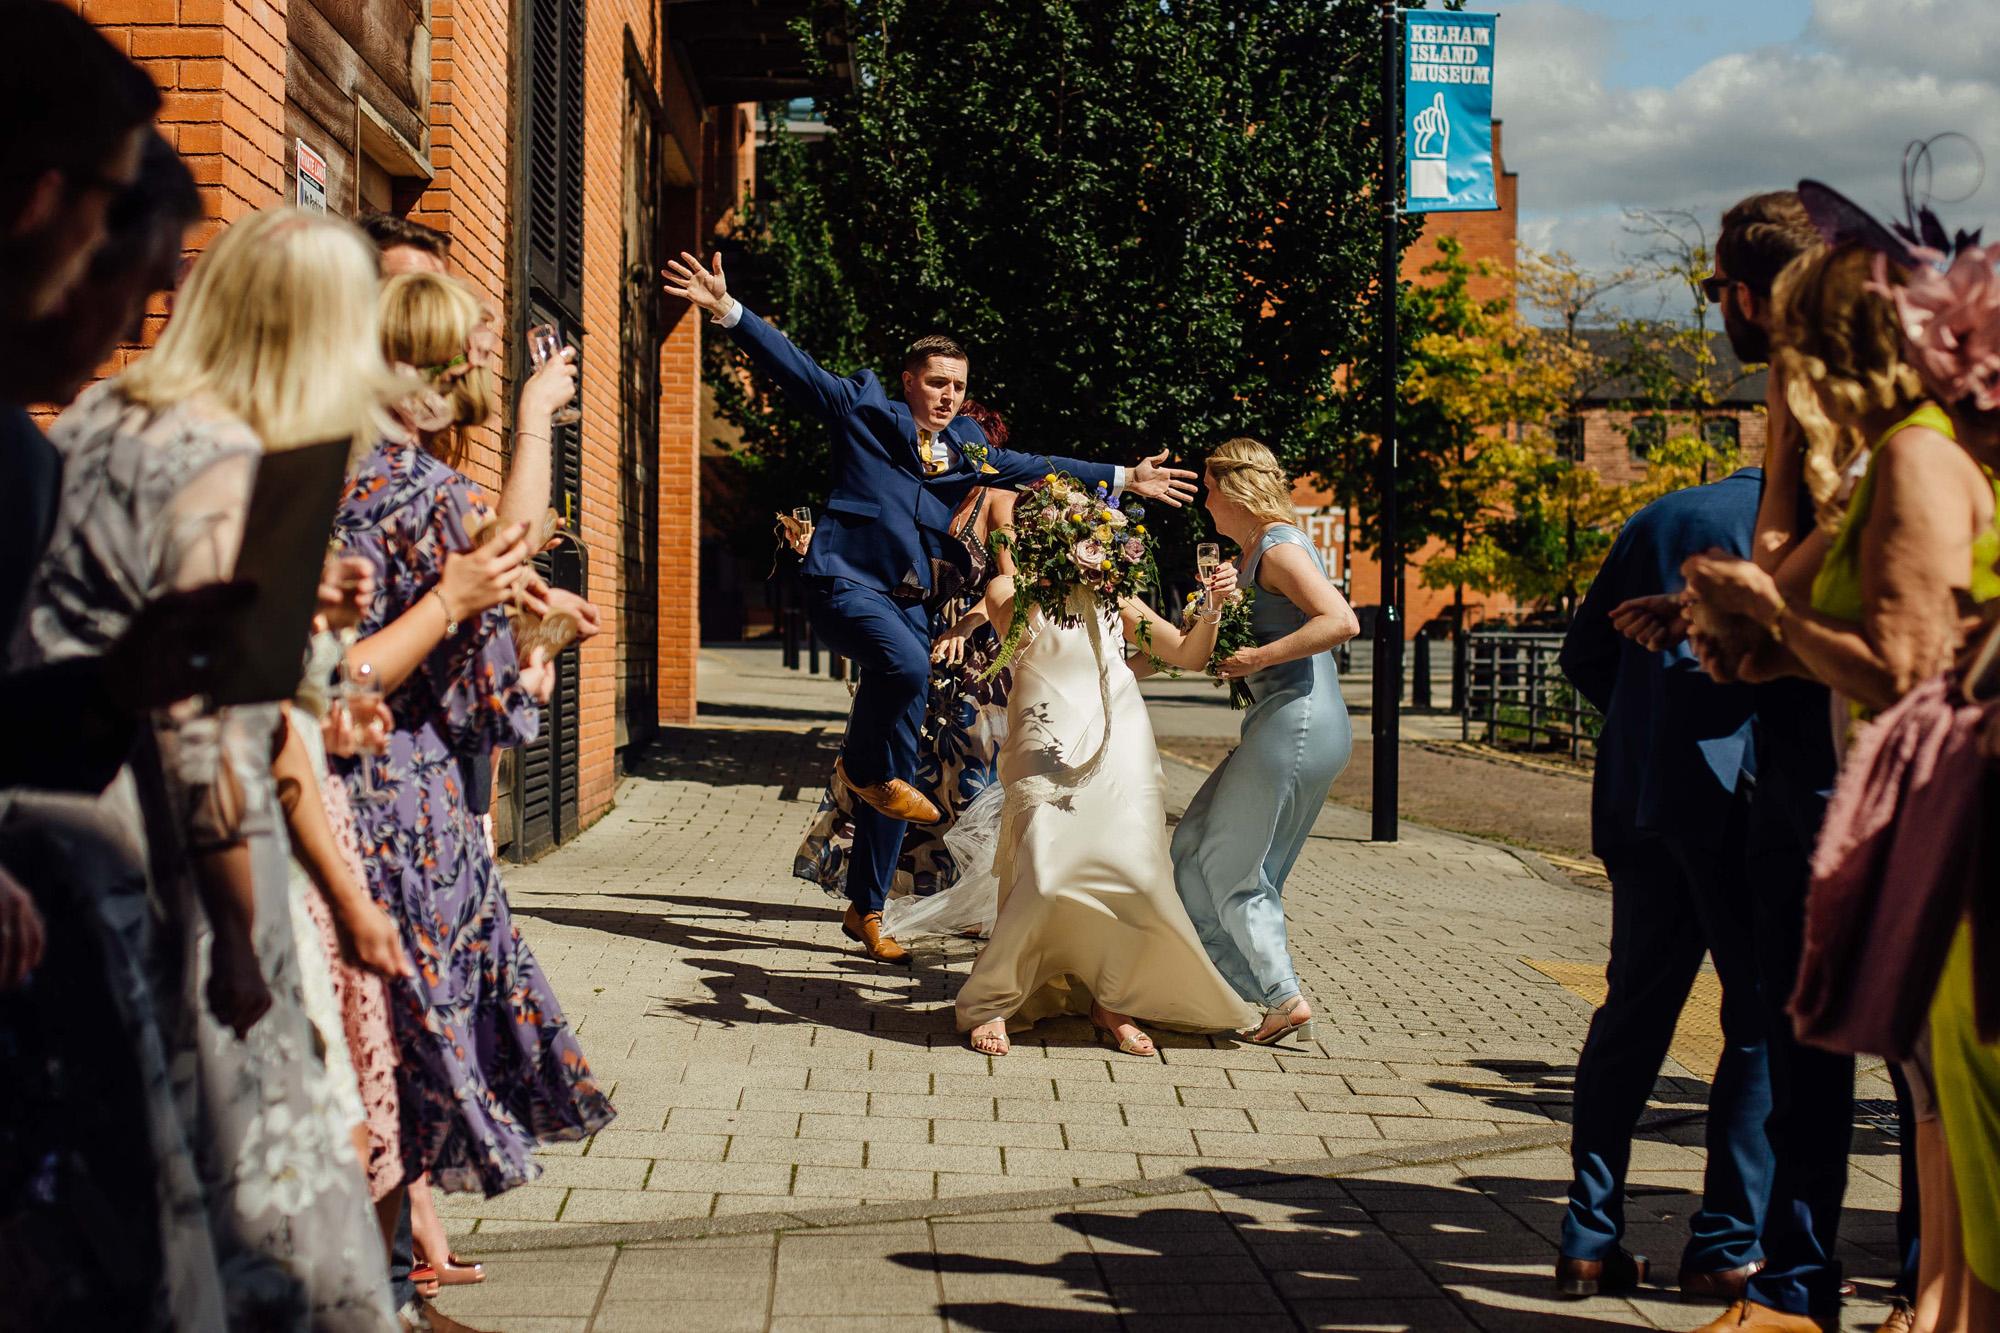 Sarah-Honeysuckle-Bias-Cut-Silk-Vintage-Inspired-Wedding-Gown-Sheffield-Wedding-Kate-Beaumont-42.jpg